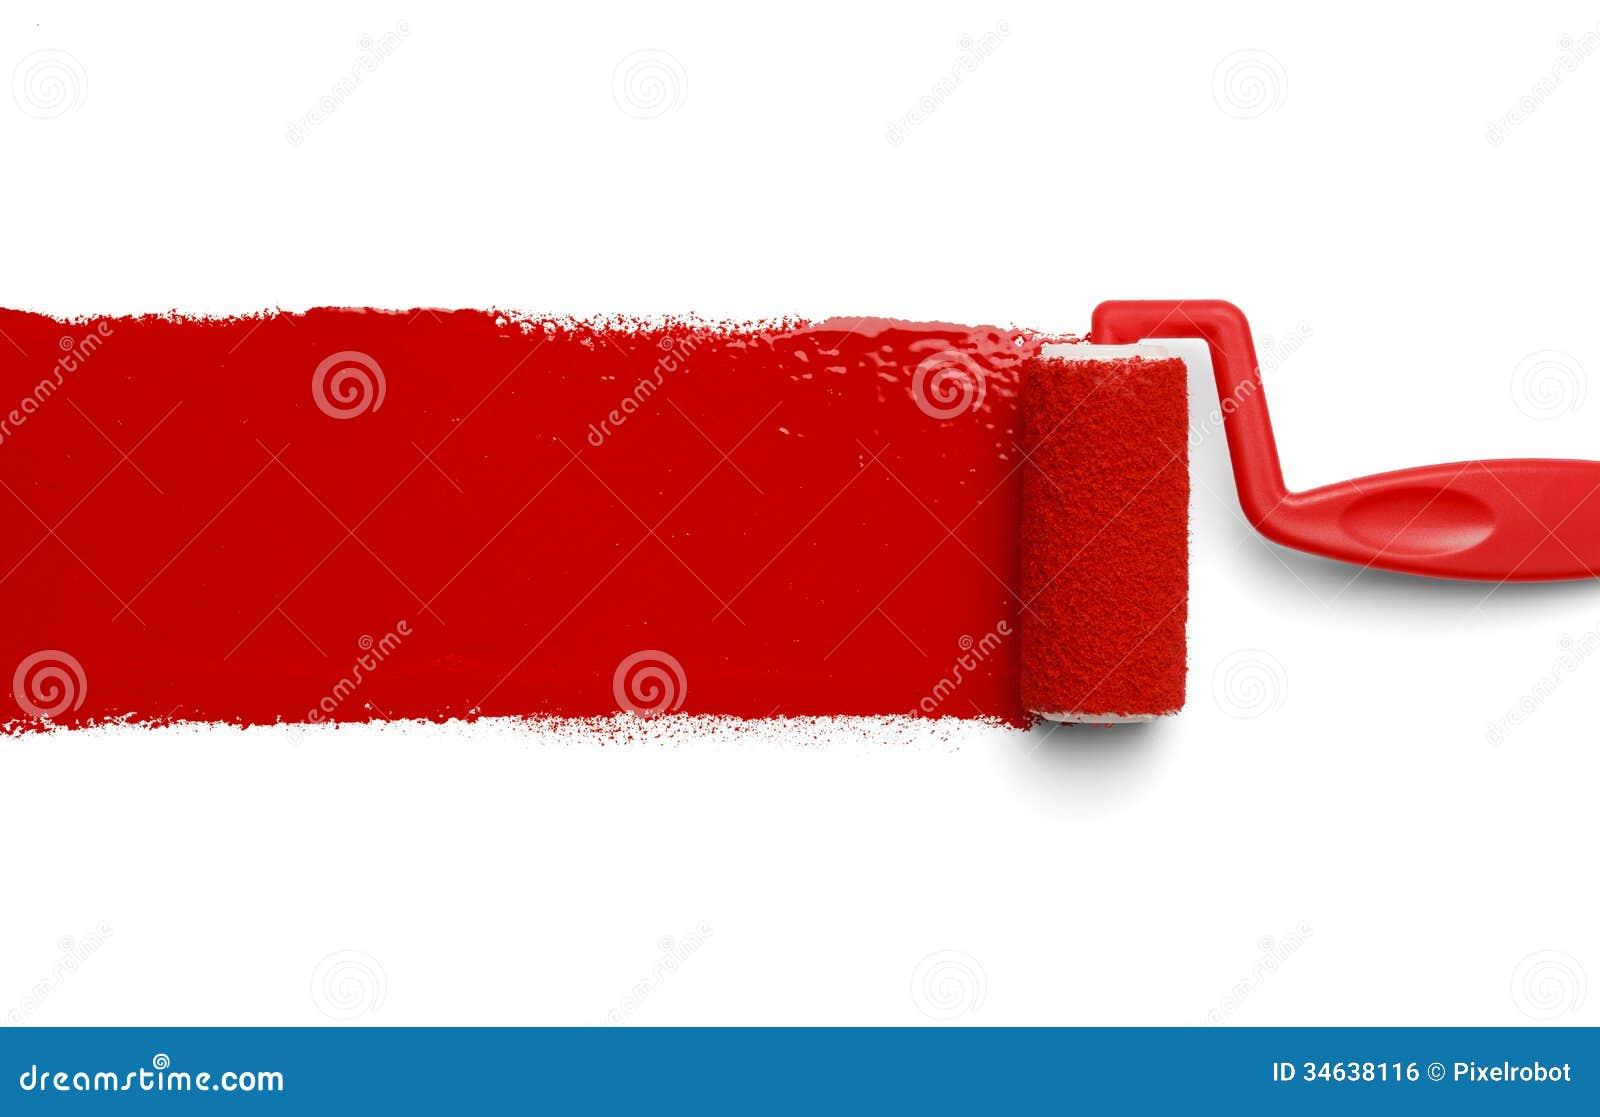 Rolo de pintura vermelho imagem de stock royalty free - Rodillos de pintura ...